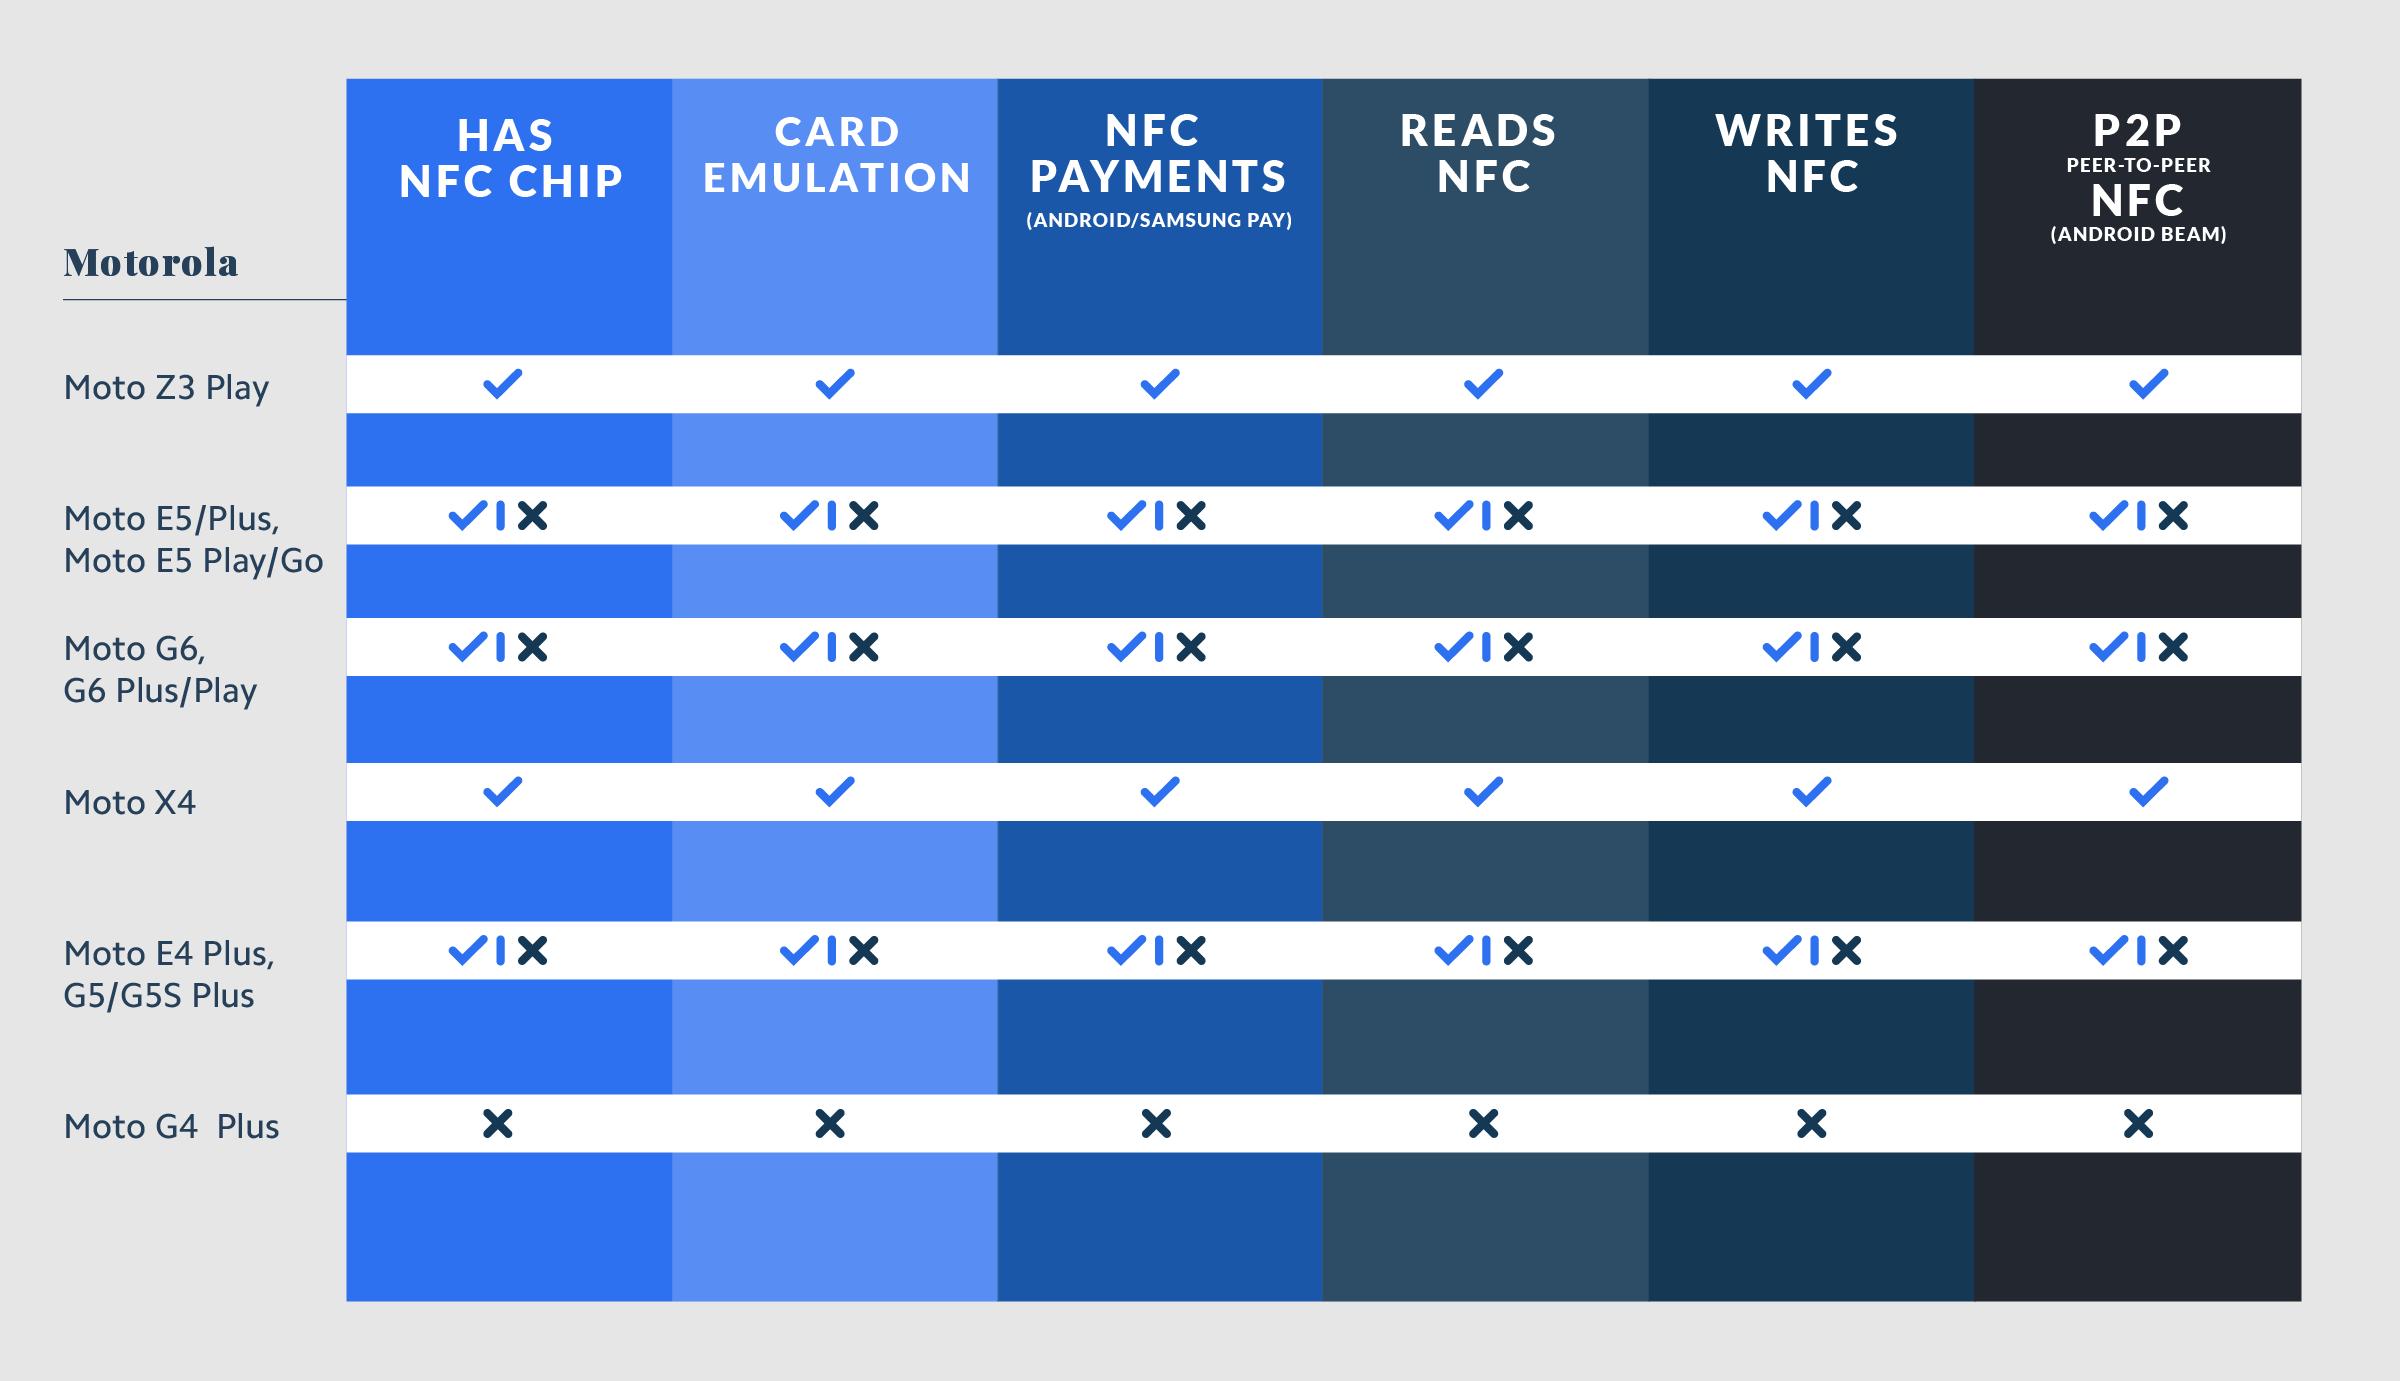 Motorola NFC Compatibility